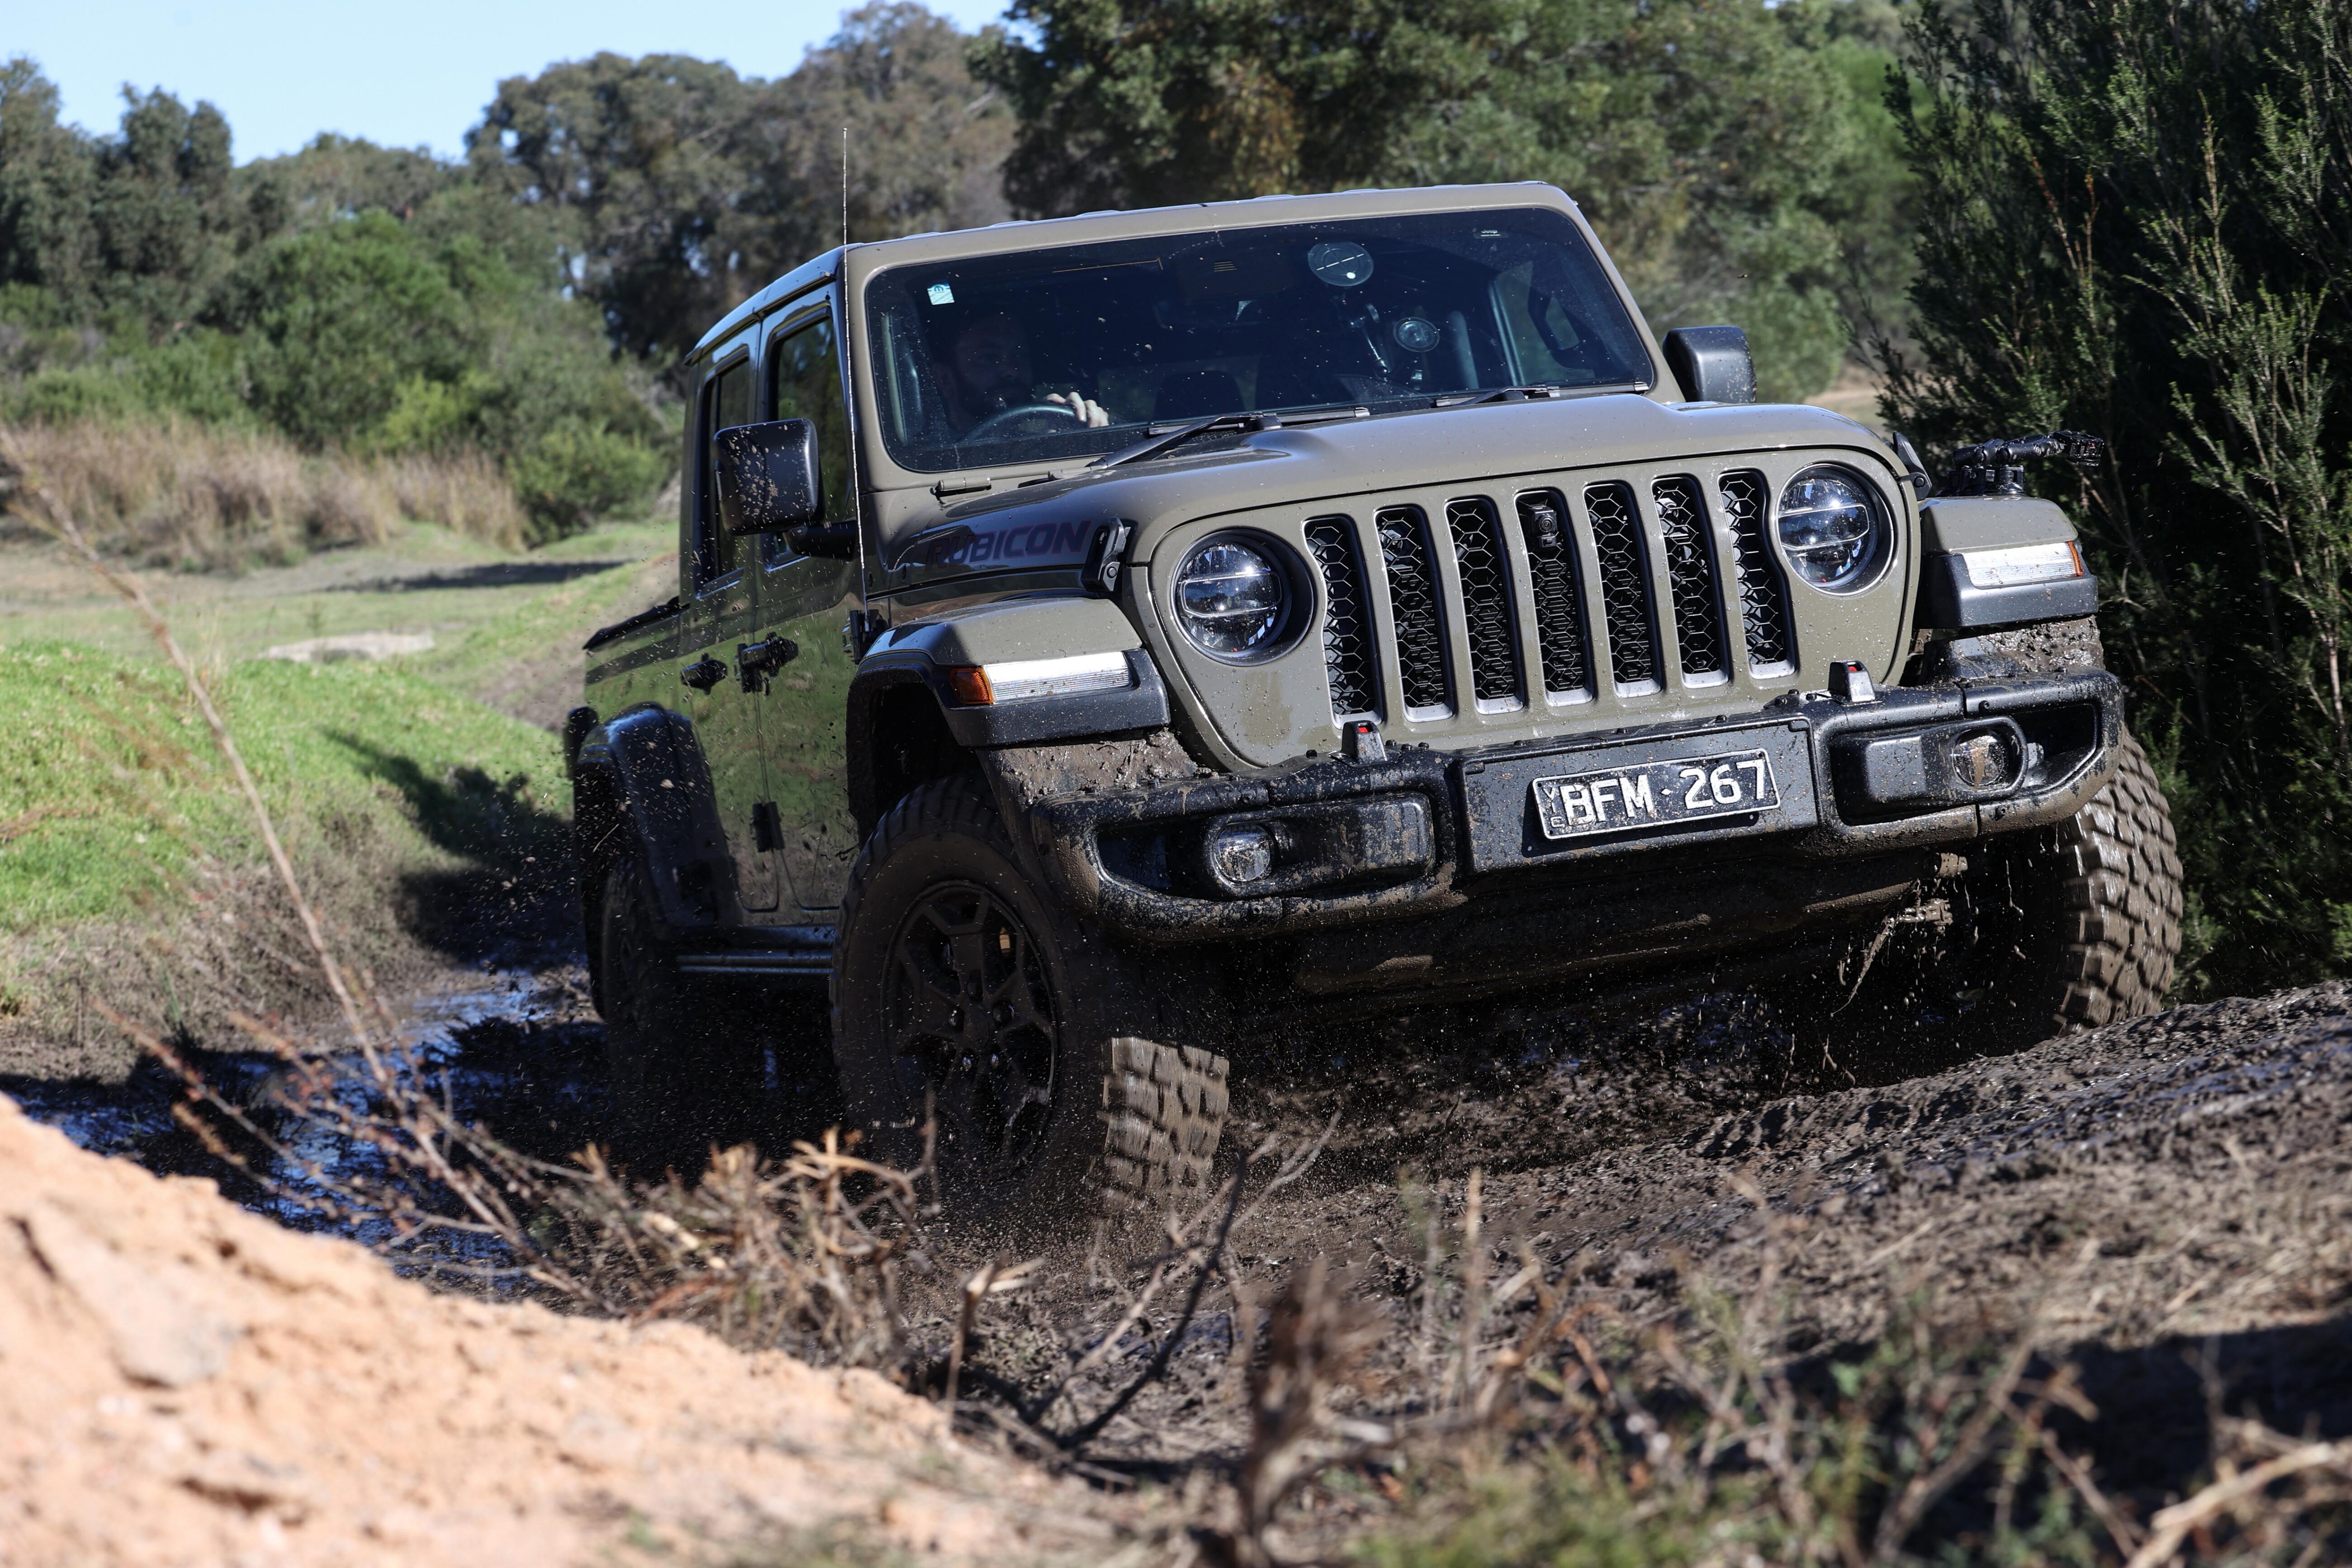 4 X 4 Australia Comparisons 2021 May 21 Jeep Gladiator Mud Driving